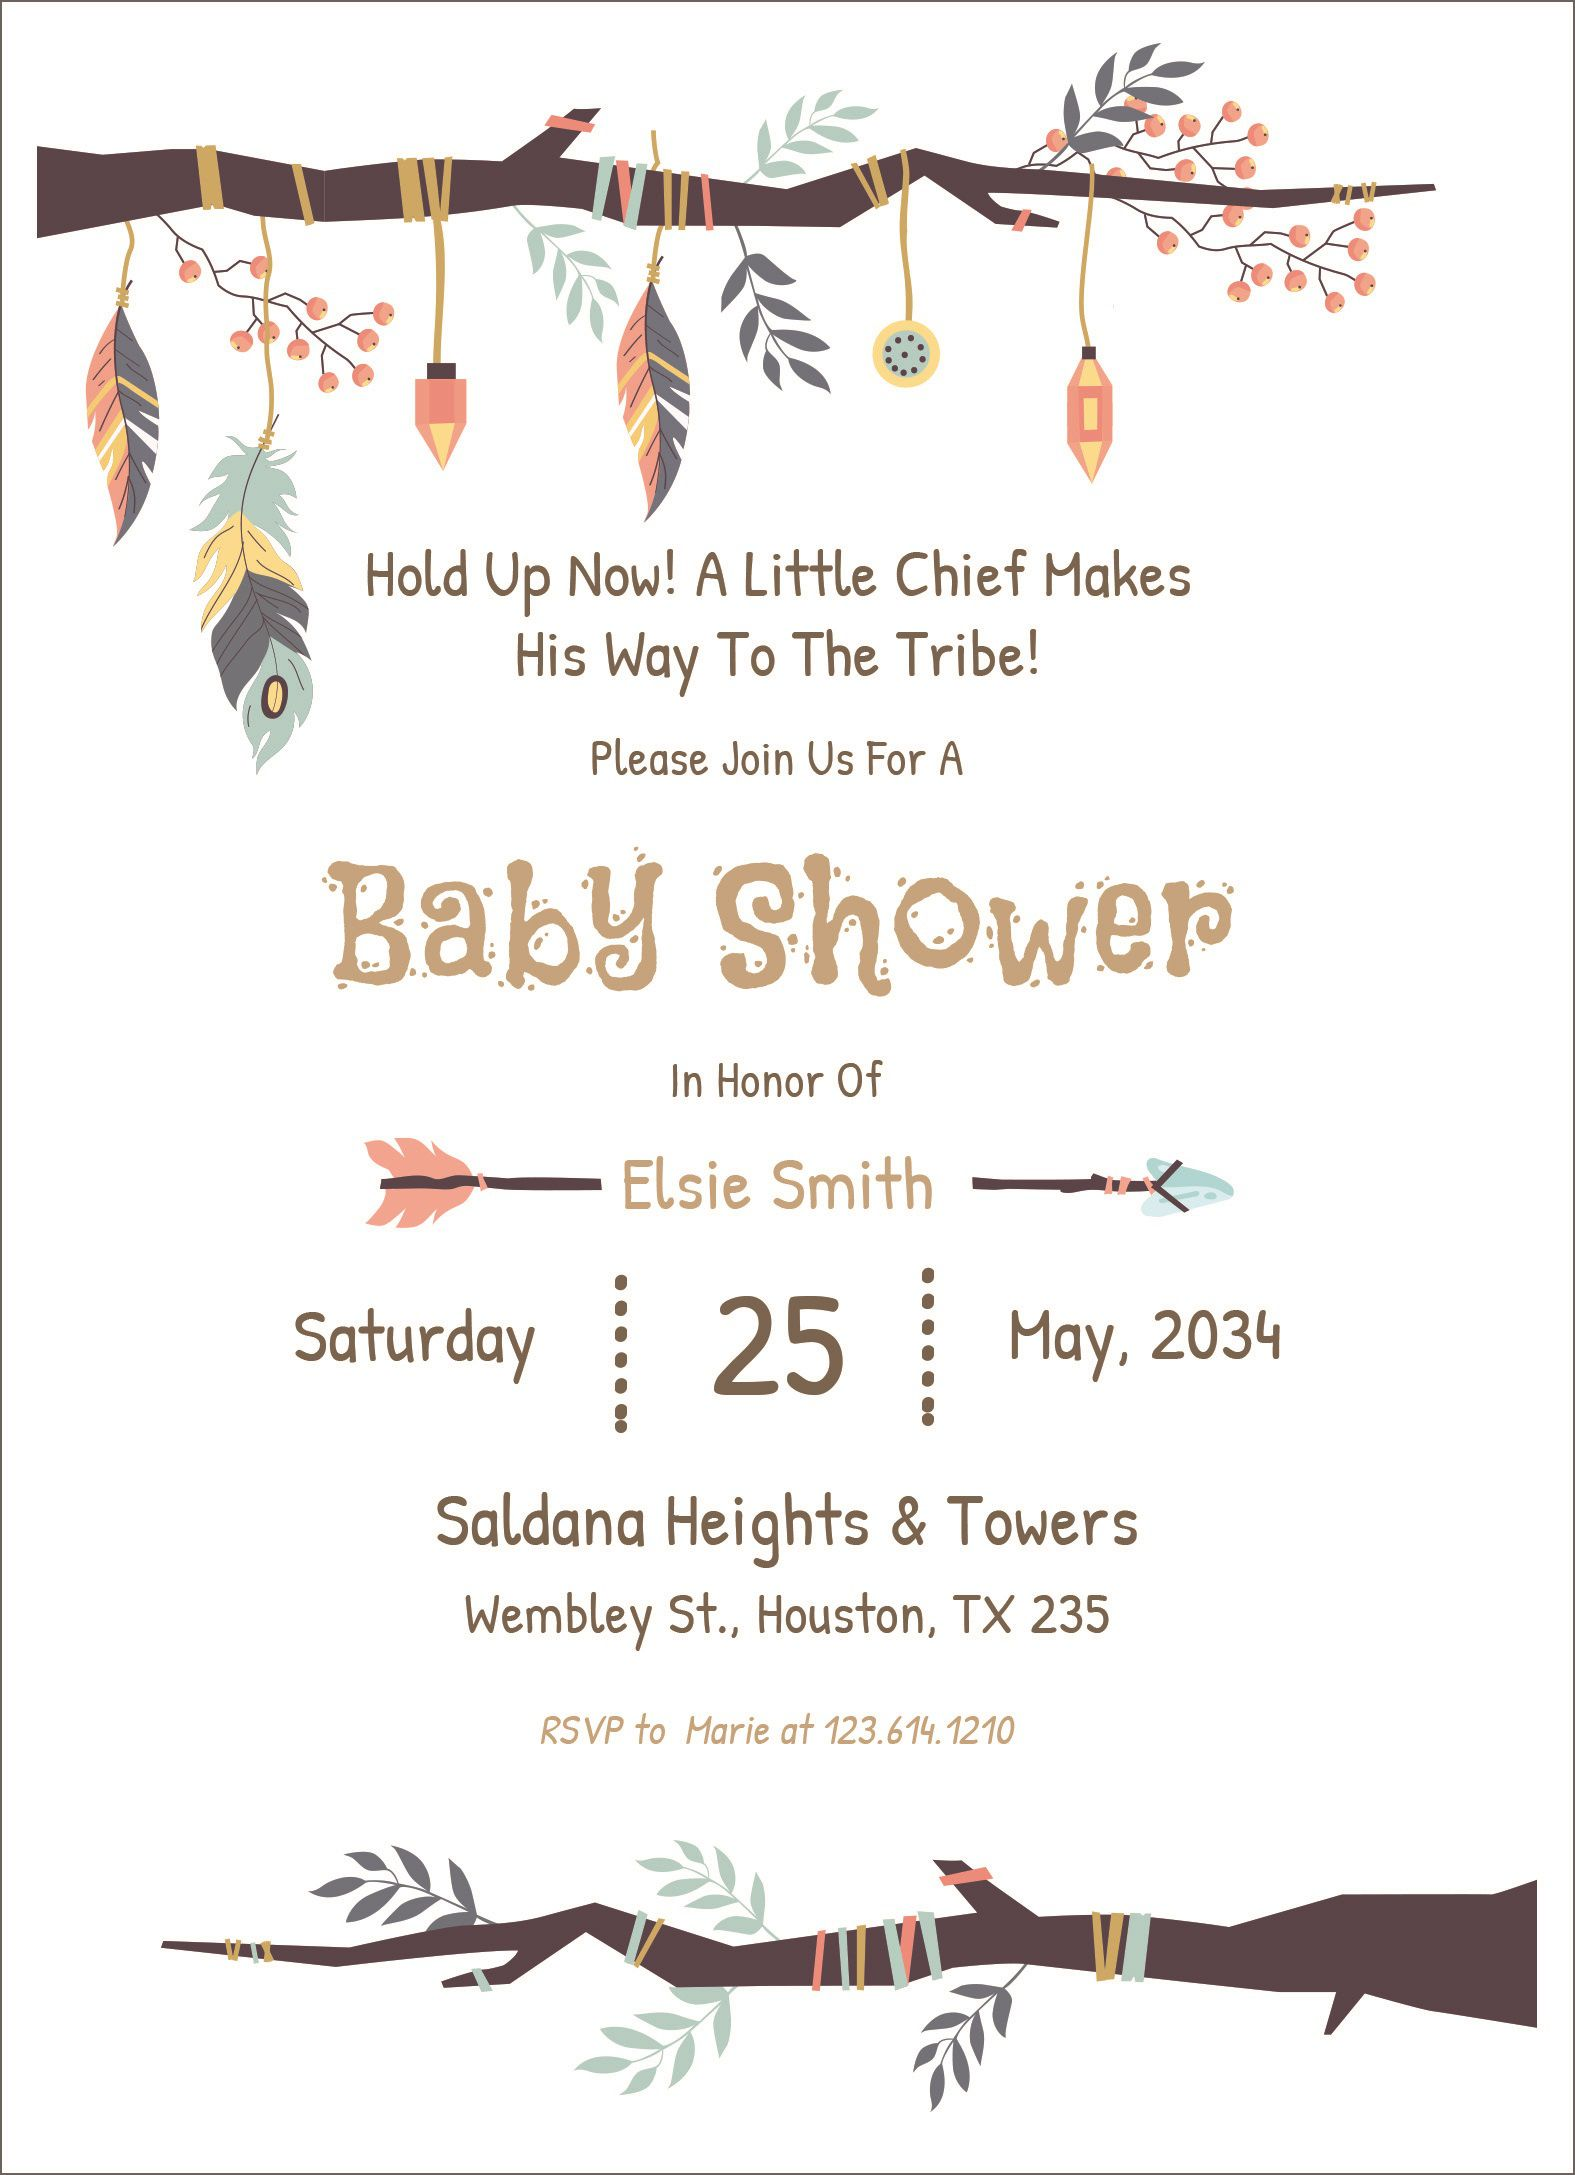 003 Formidable Free Baby Shower Invitation Template Editable High Def  Digital Microsoft WordFull